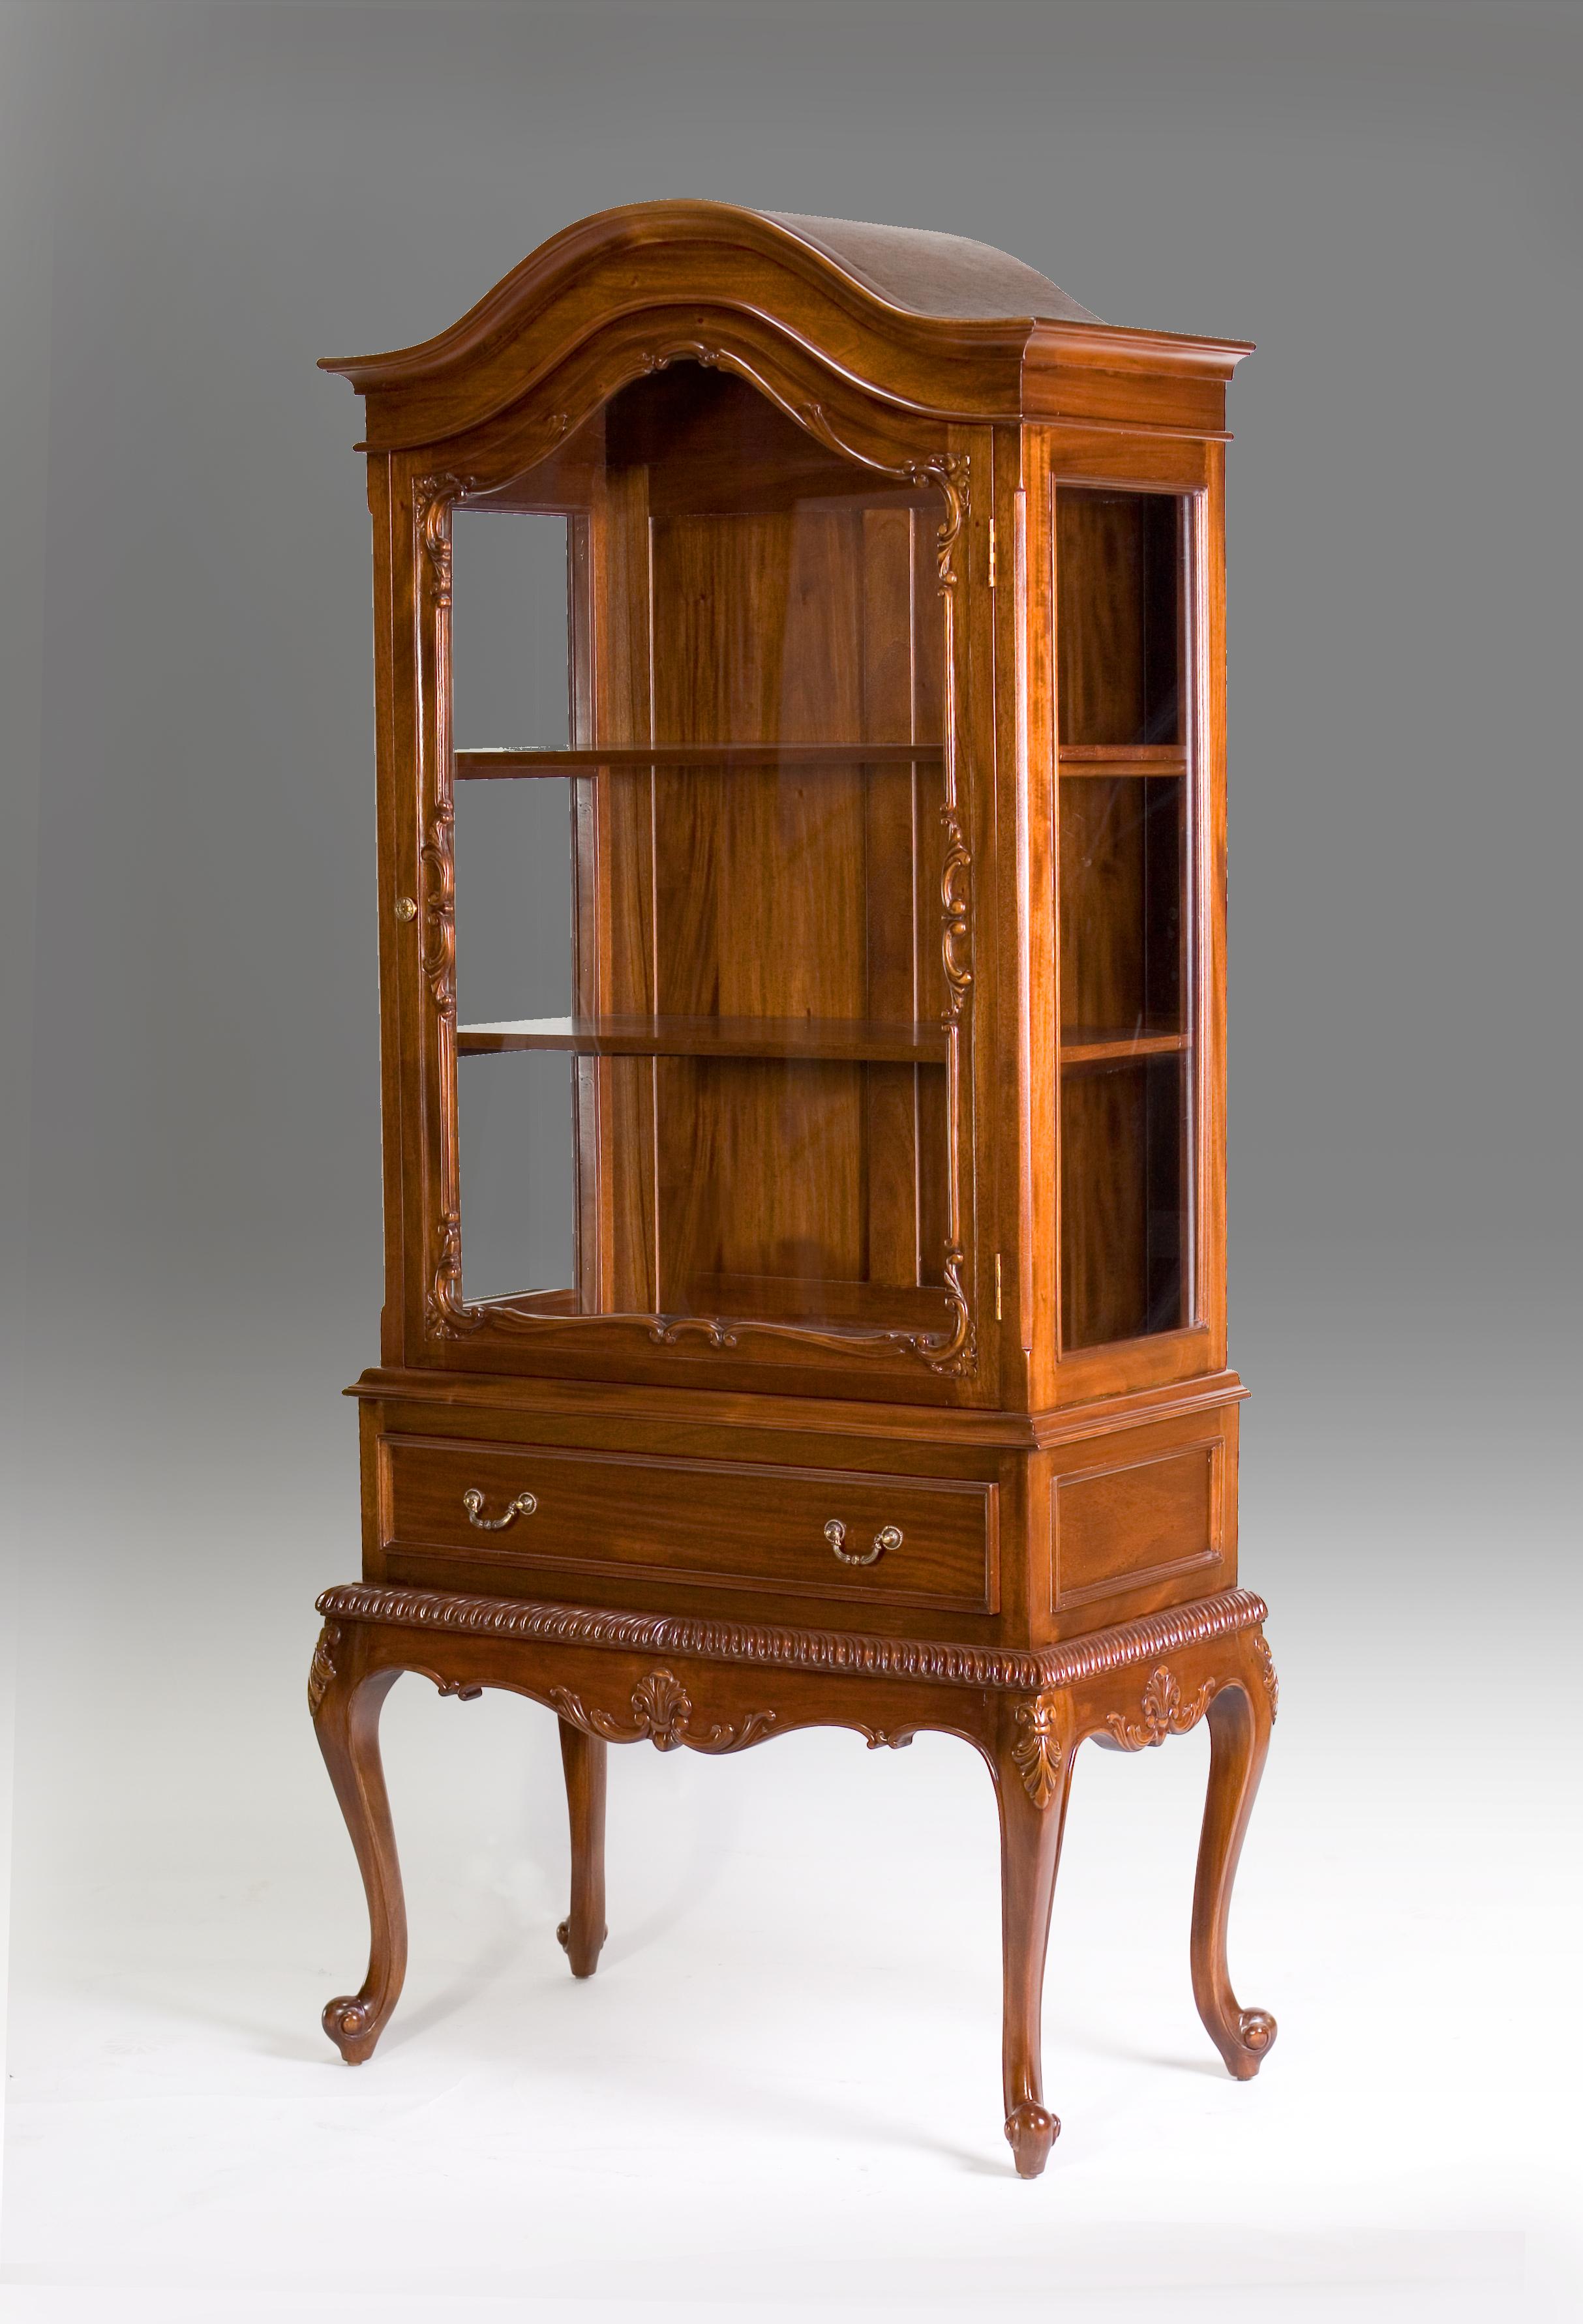 CA005 - Dutch Style Display Showcase Cabinet